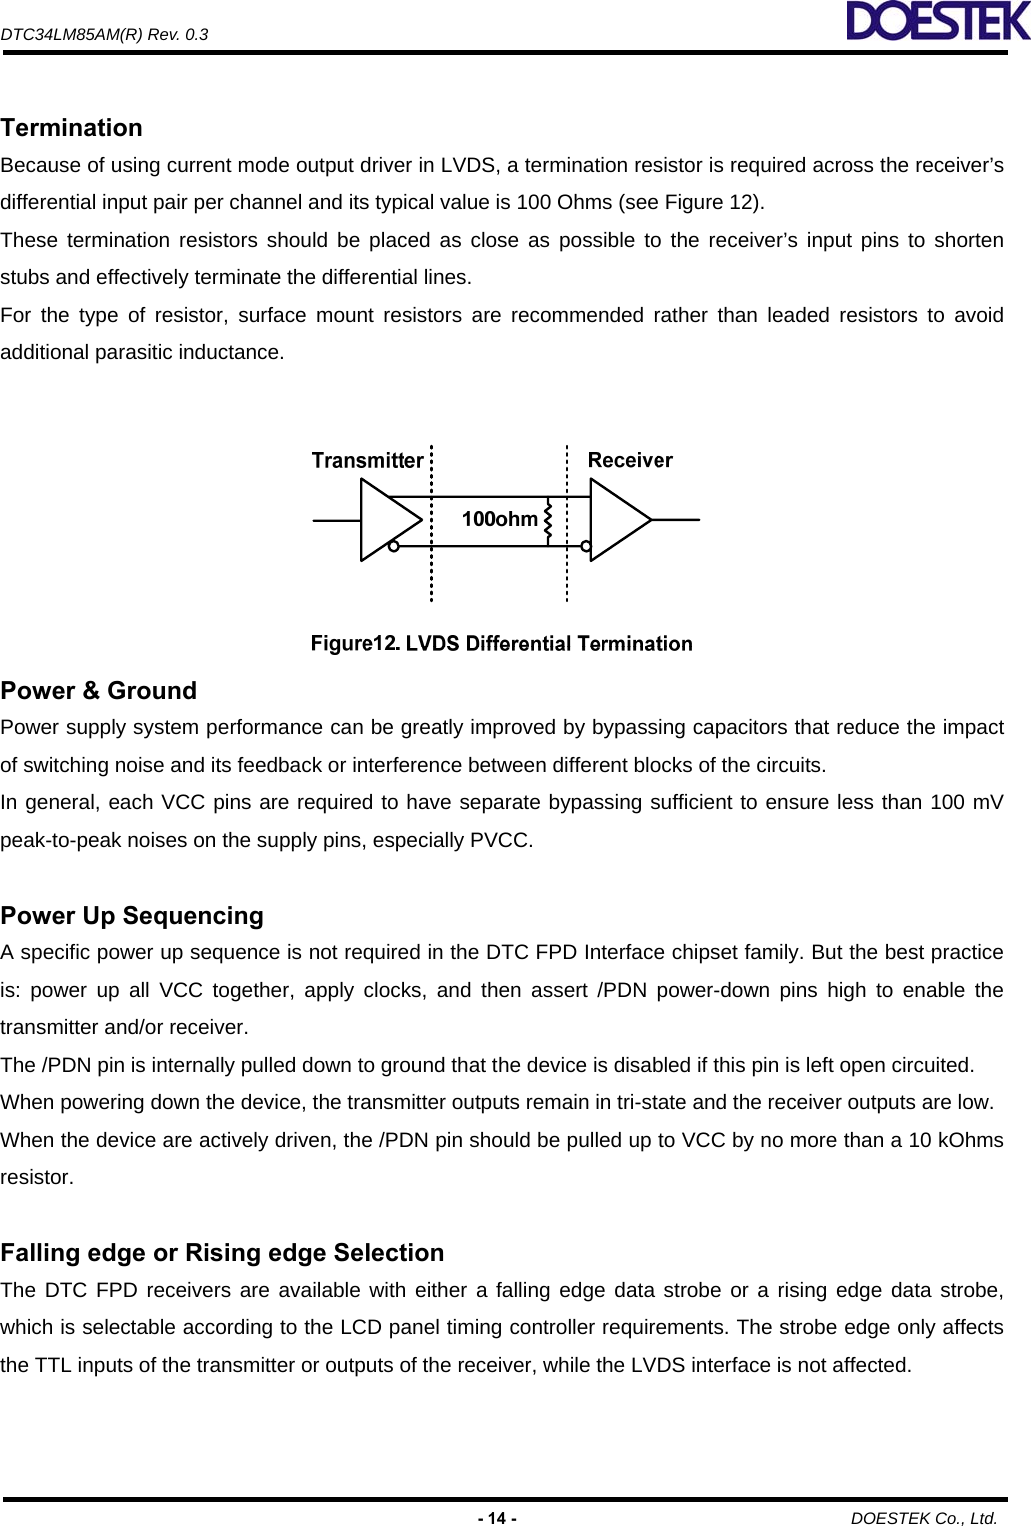 DTC34LM85AM Datasheet  Www s manuals com  R0 3 Doestek